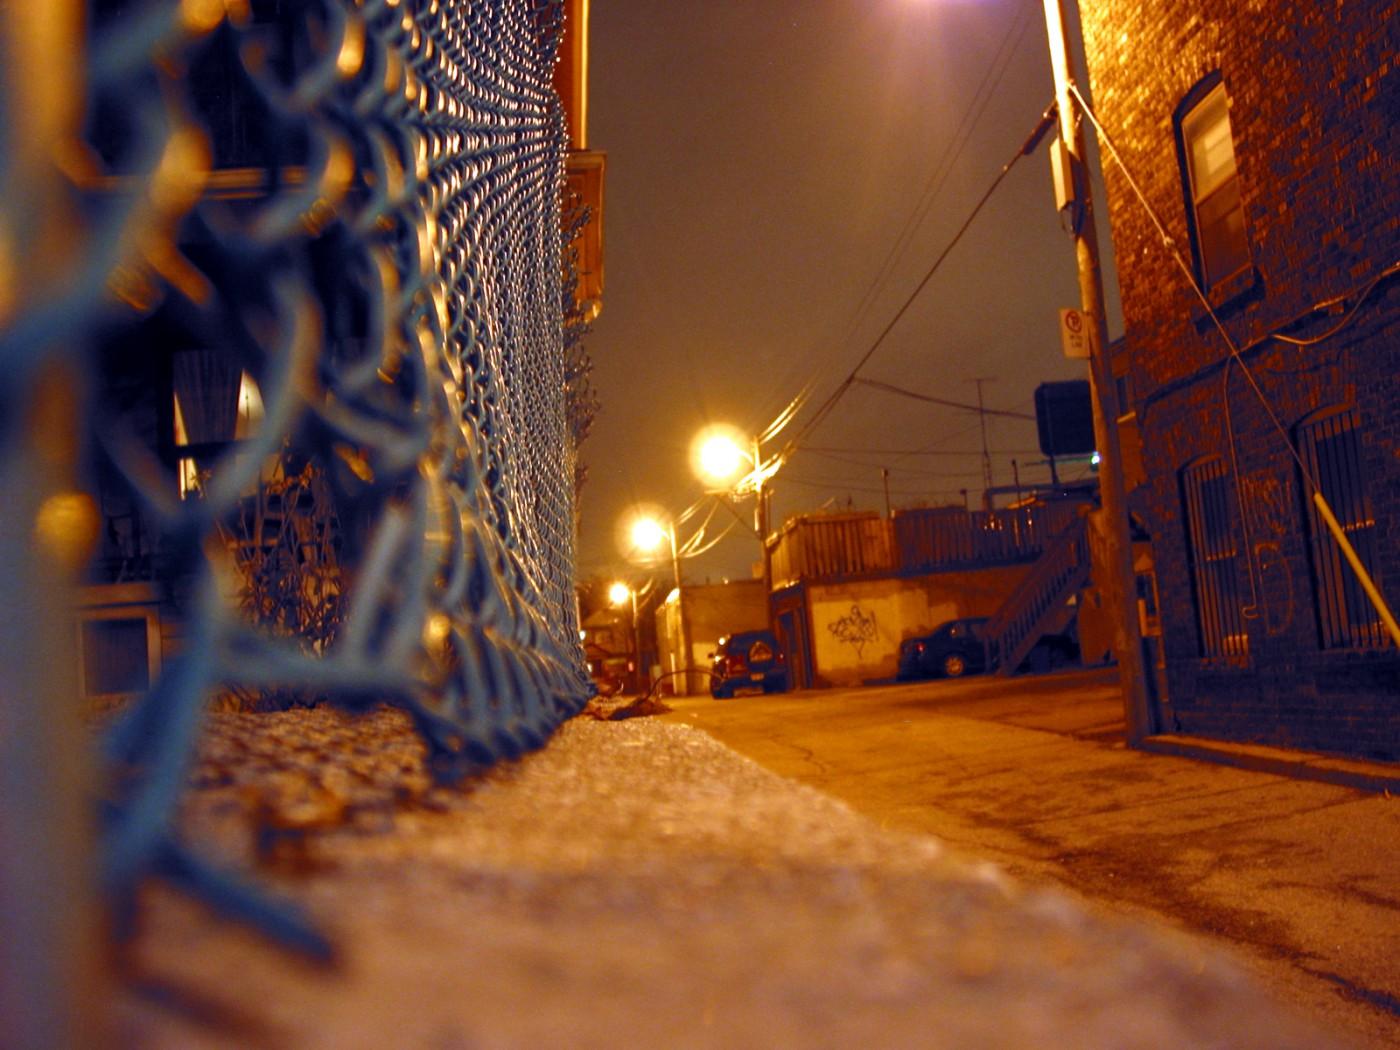 Sandro Loschiavo, </span><span><em>Dark Alley, 2006</em>, </span><span>Digitial Print  8x10